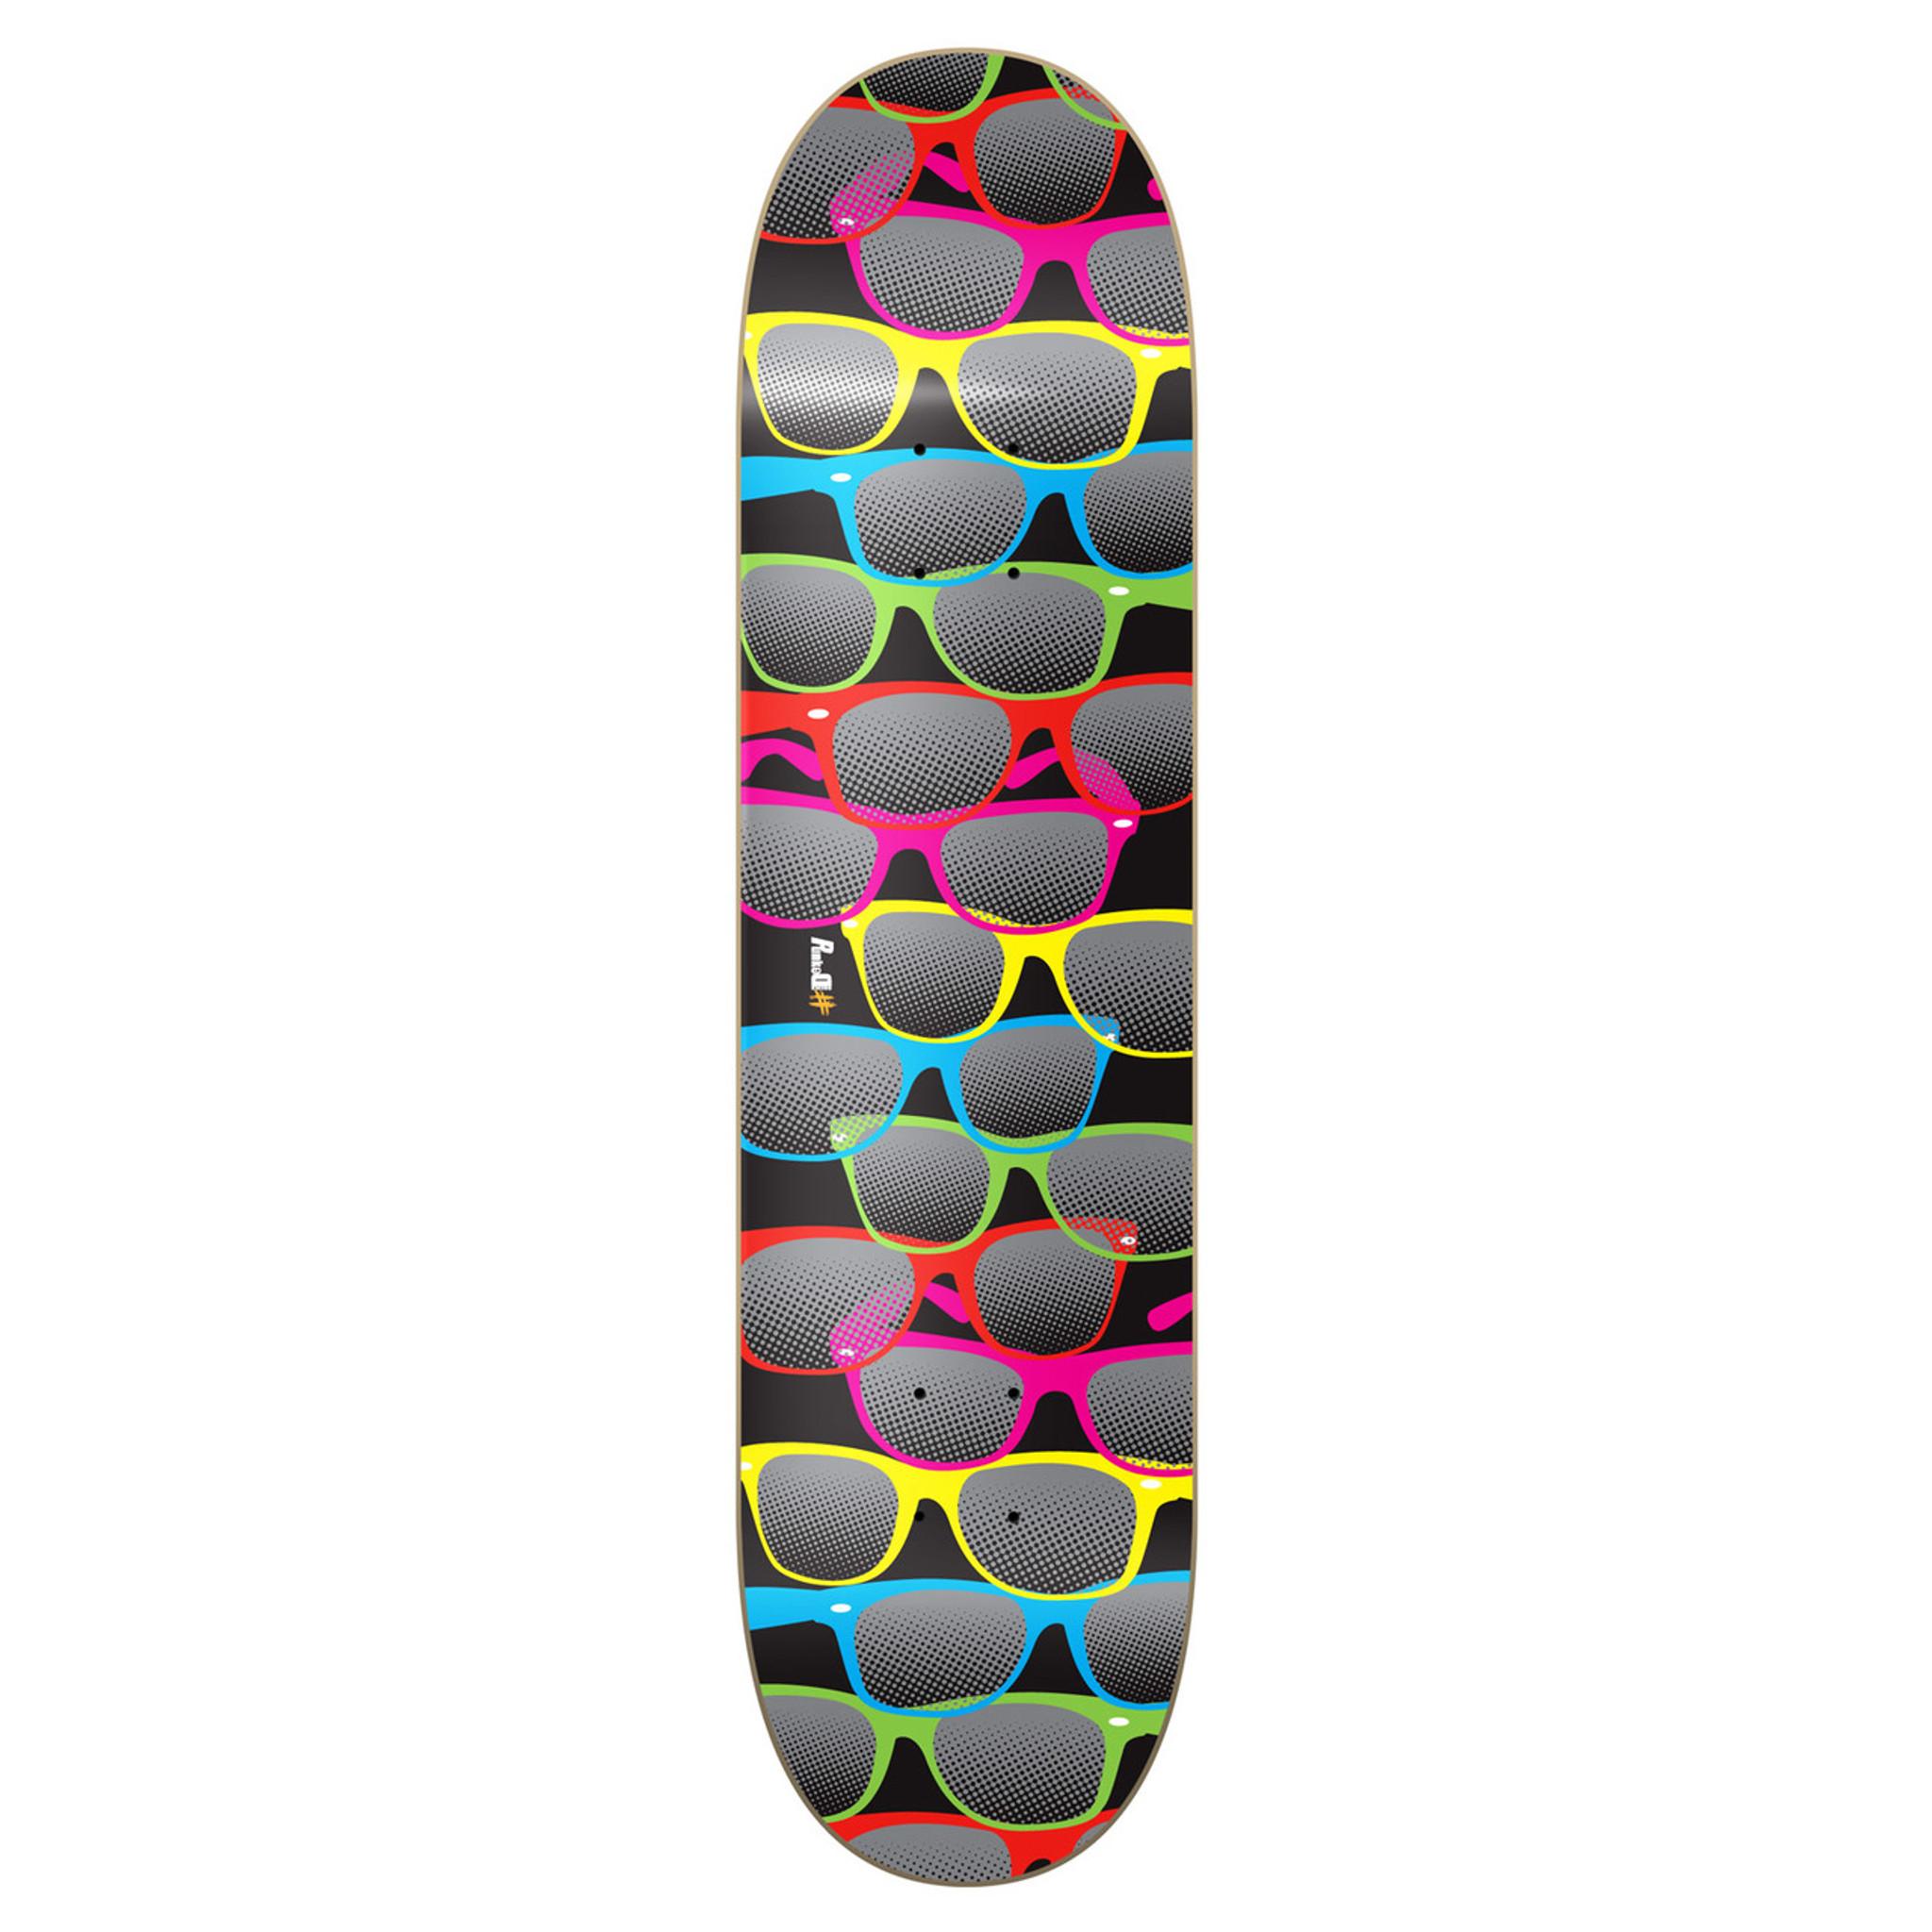 Bandana Black 7.5 inch Yocaher Graphic Skateboard Deck